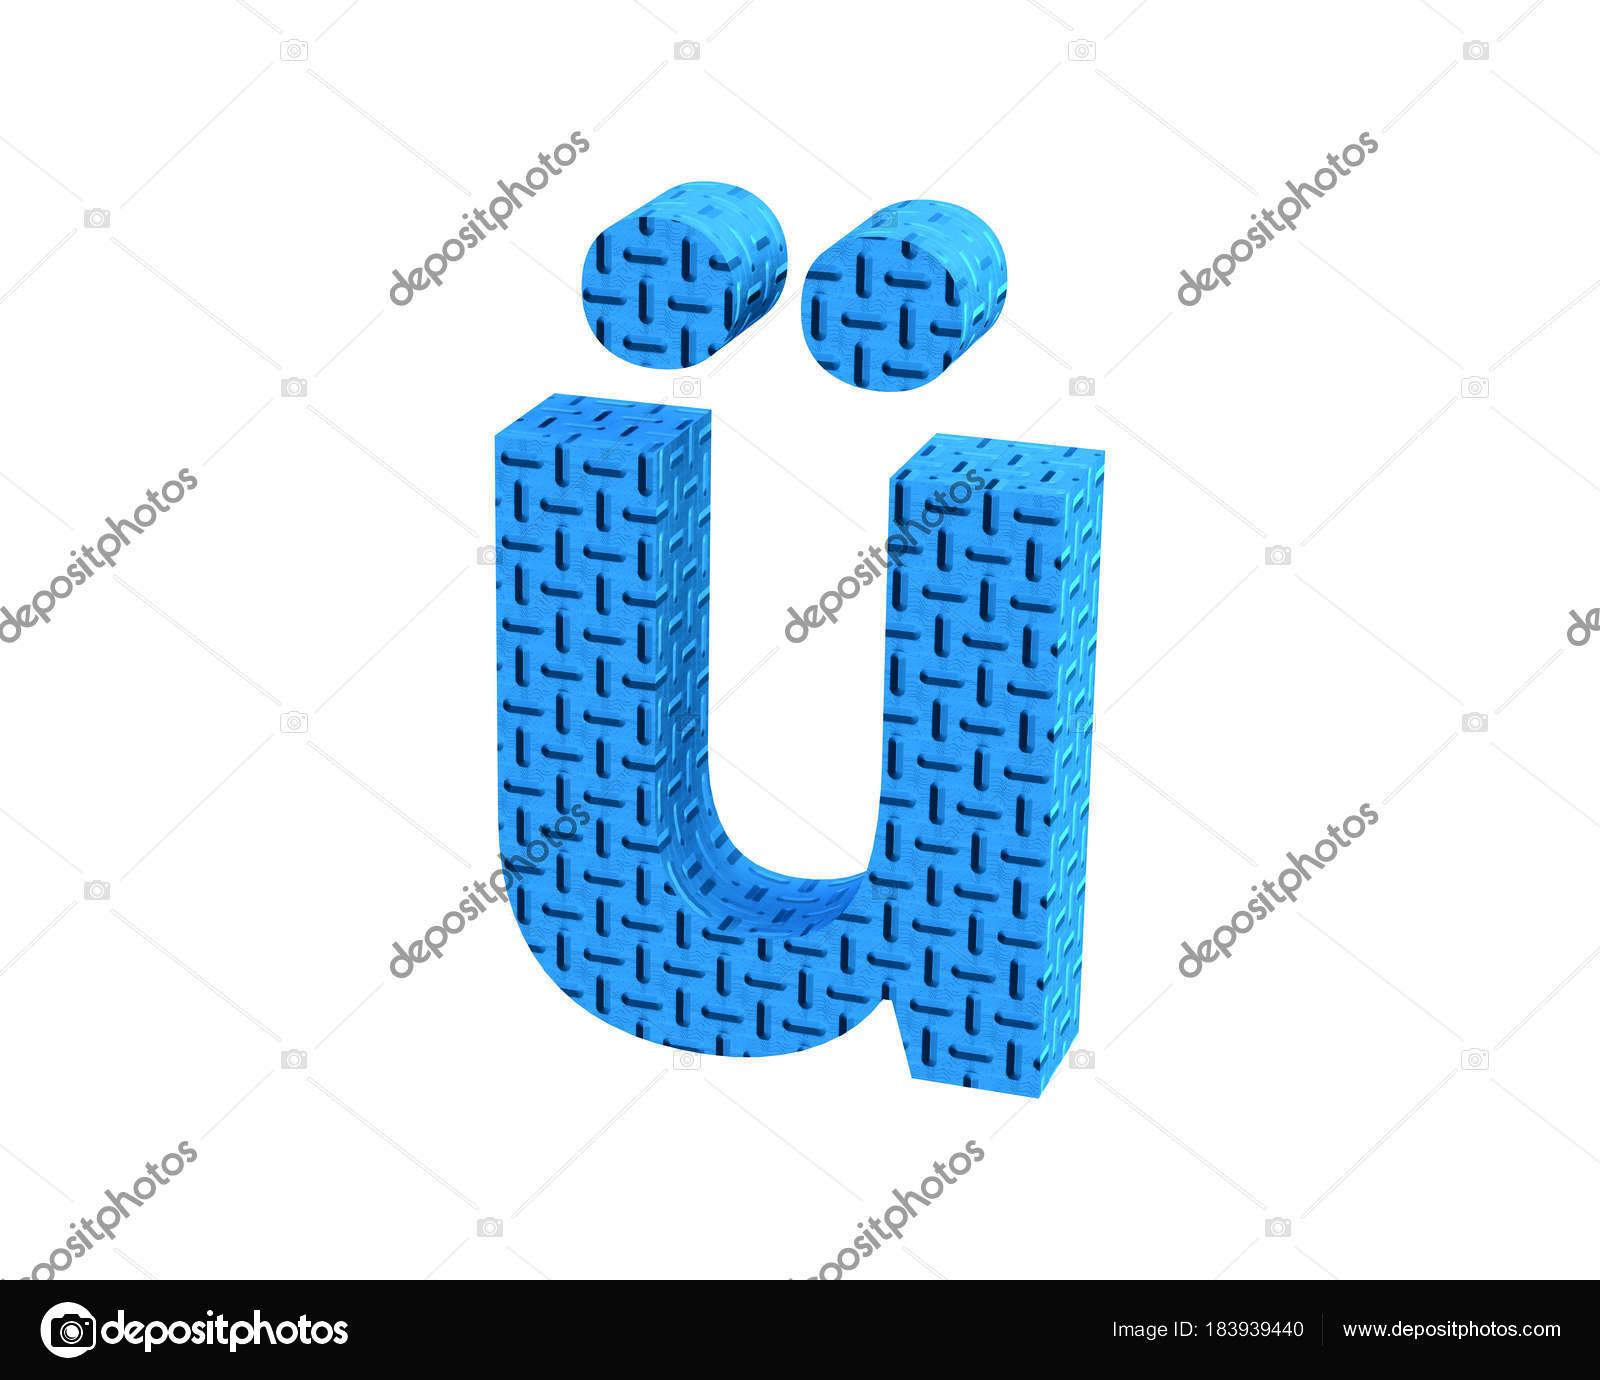 3D rendering Font Plastic blue treadplate special character ALT0252 u2014 Photo by dhz-ontwerpen@hotmail.com  sc 1 st  Depositphotos & Font Plastic blue treadplate special character ALT0252 render ...